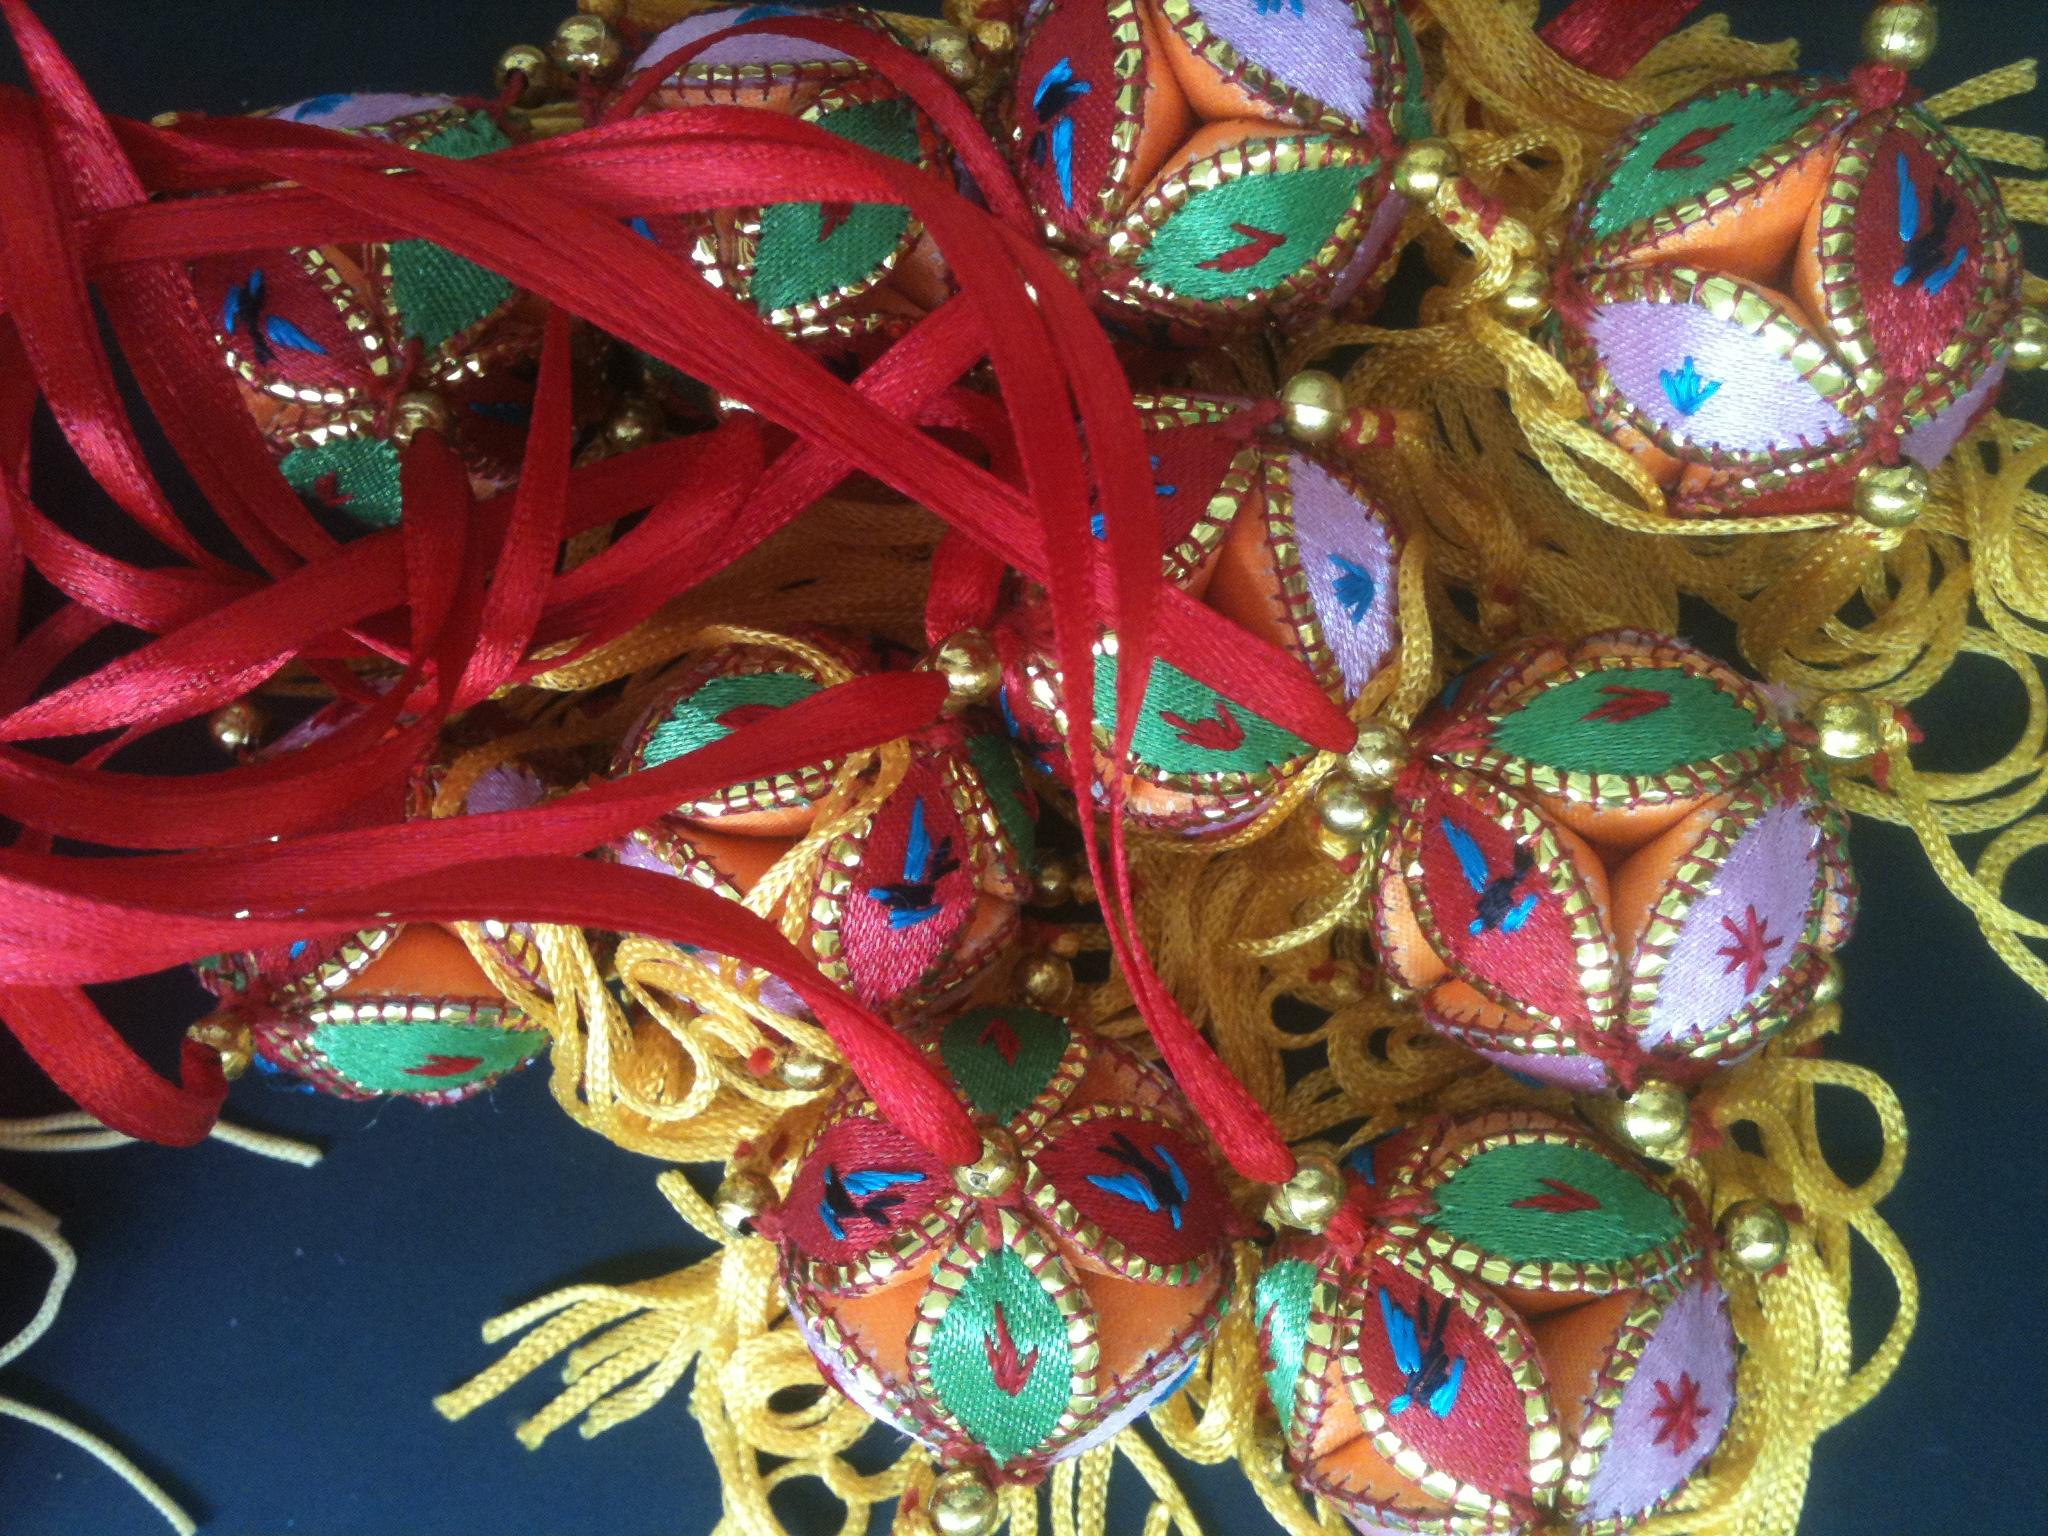 2CM广西绣球 婚庆用品 包包挂件把玩活动道具 生日礼物 壮族绣球